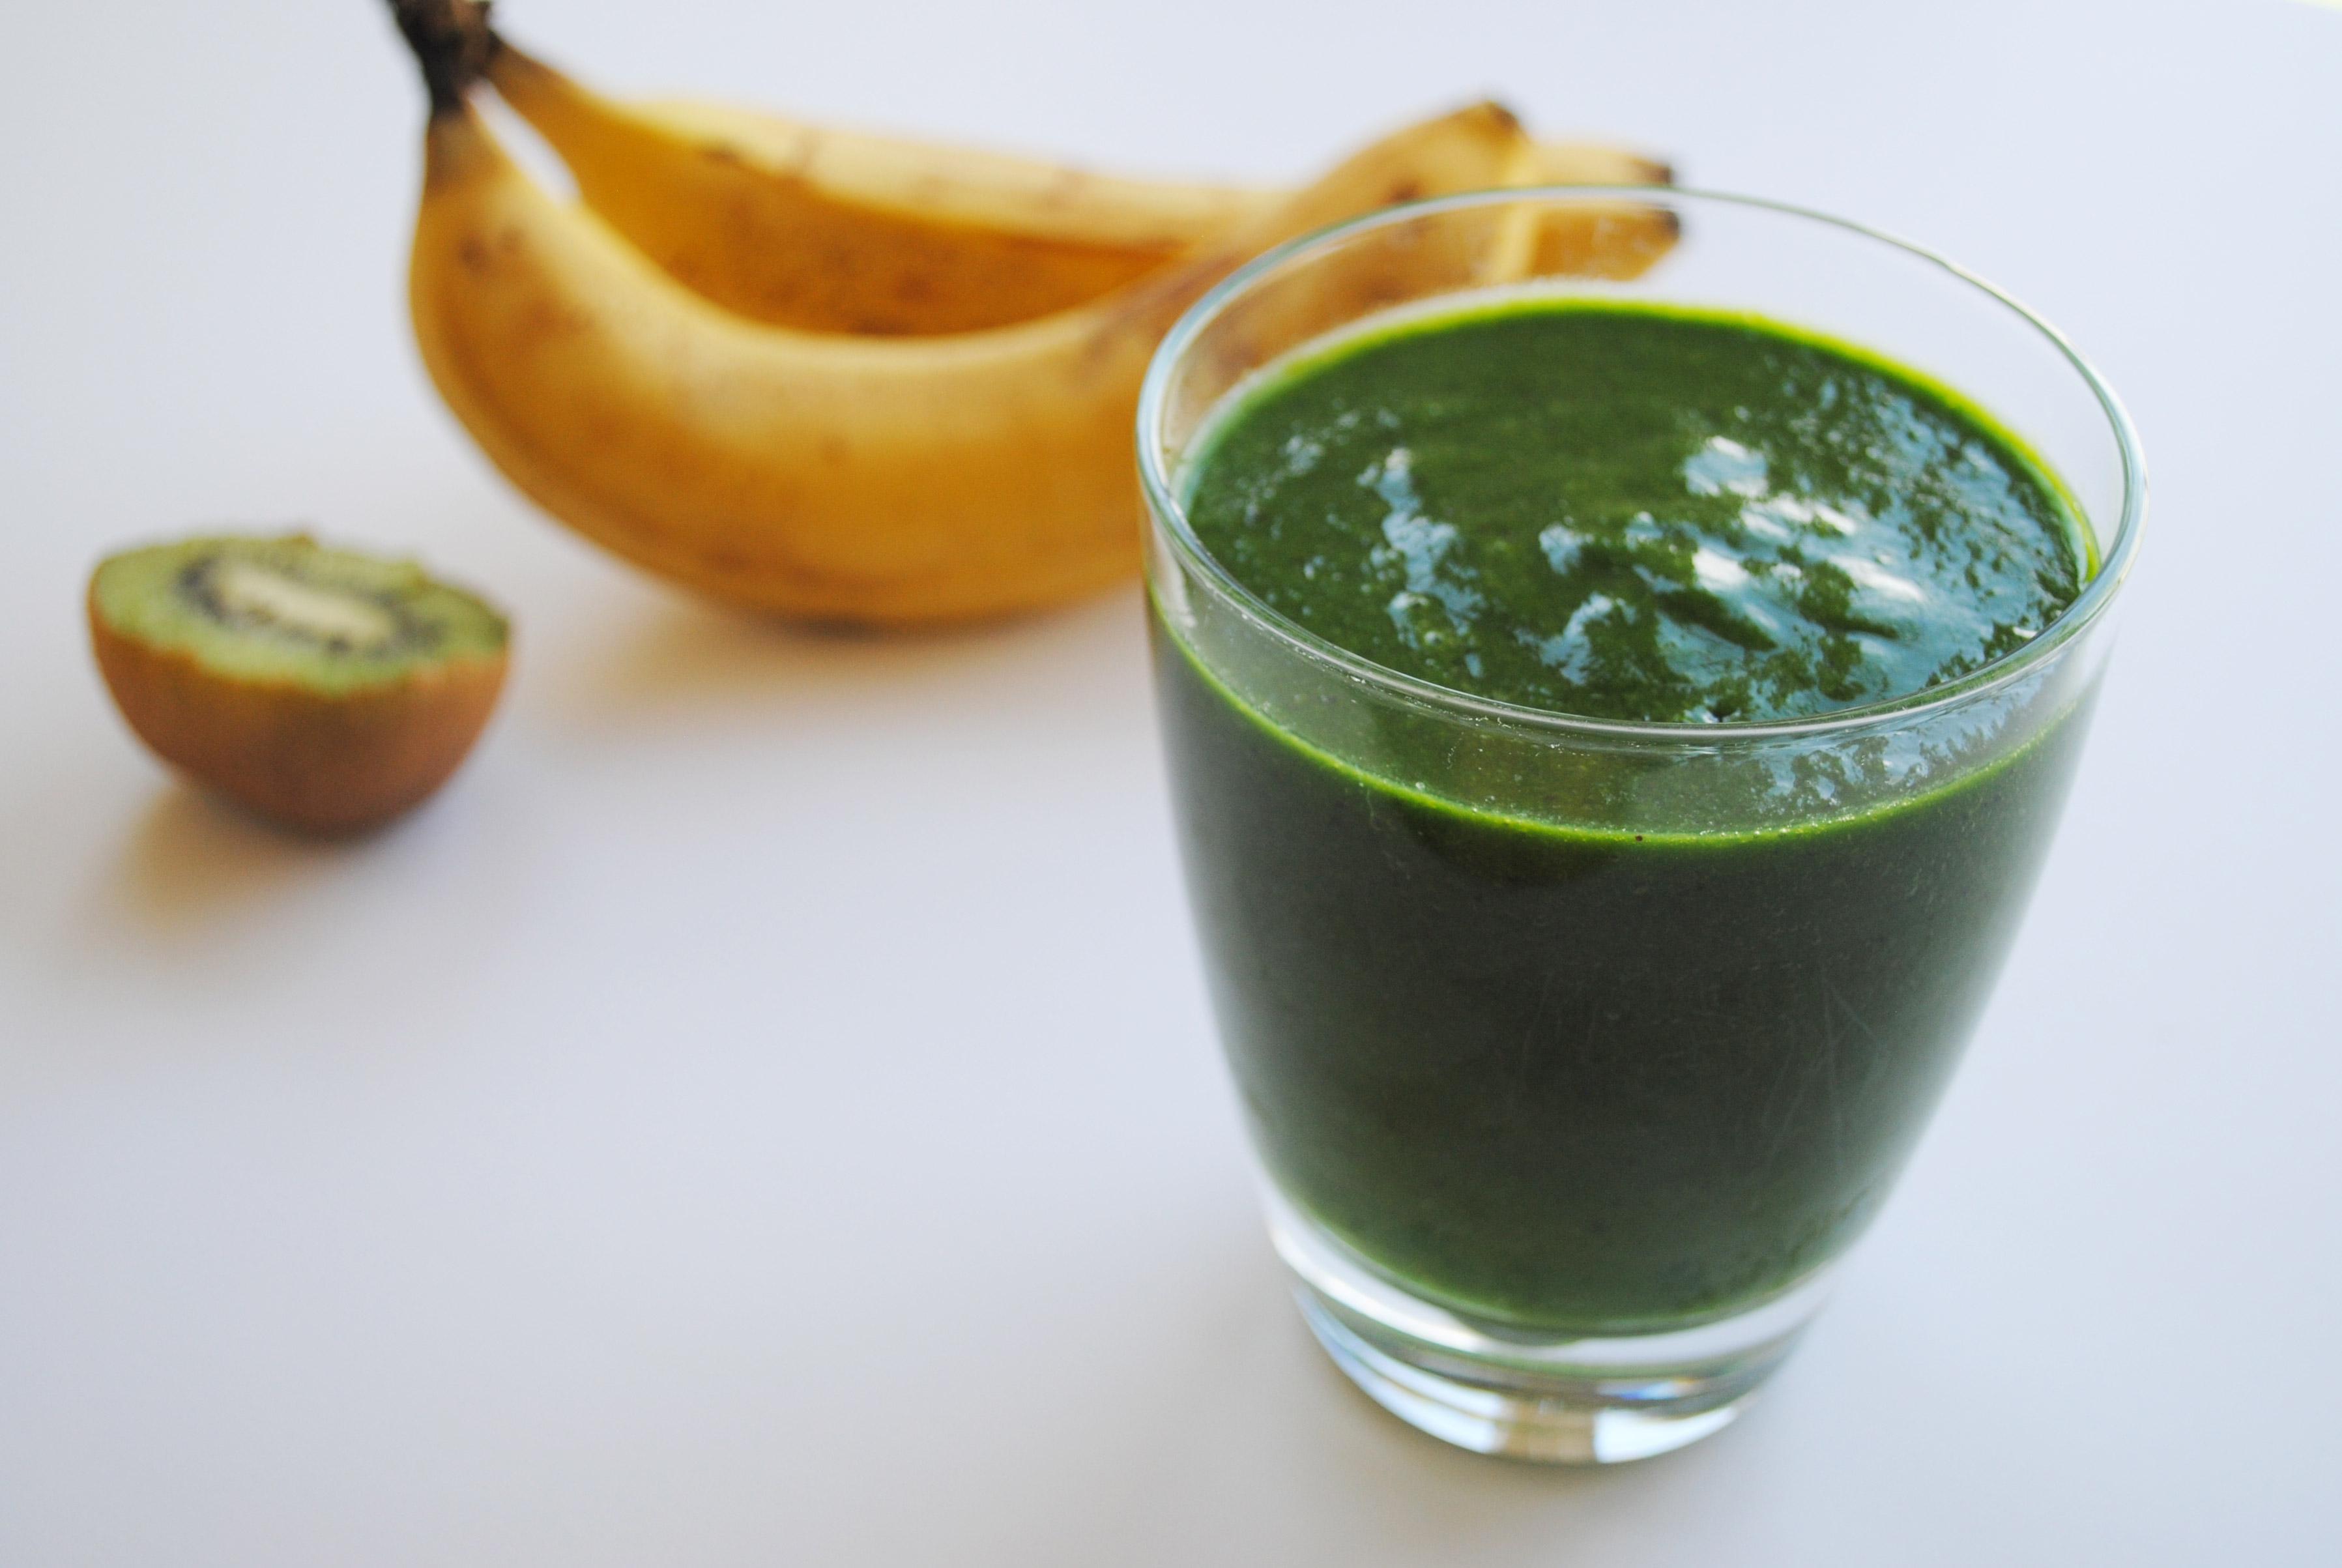 Kale Super-Start Smoothie